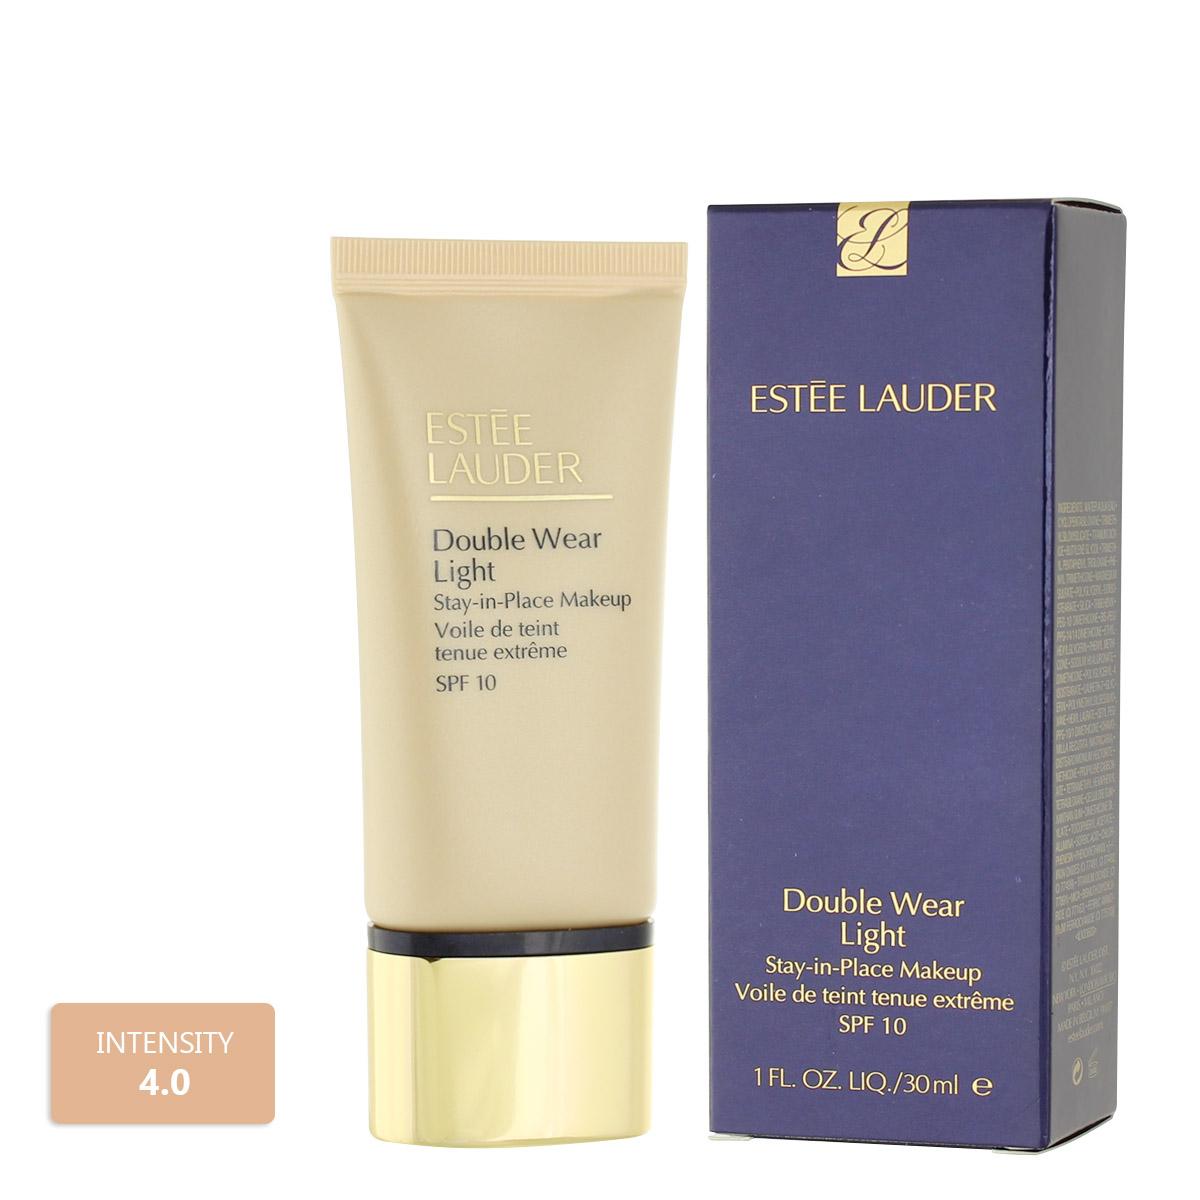 Estée Lauder Double Wear All-Day Glow BB Makeup (INTENSITY 4.0) 30 ml